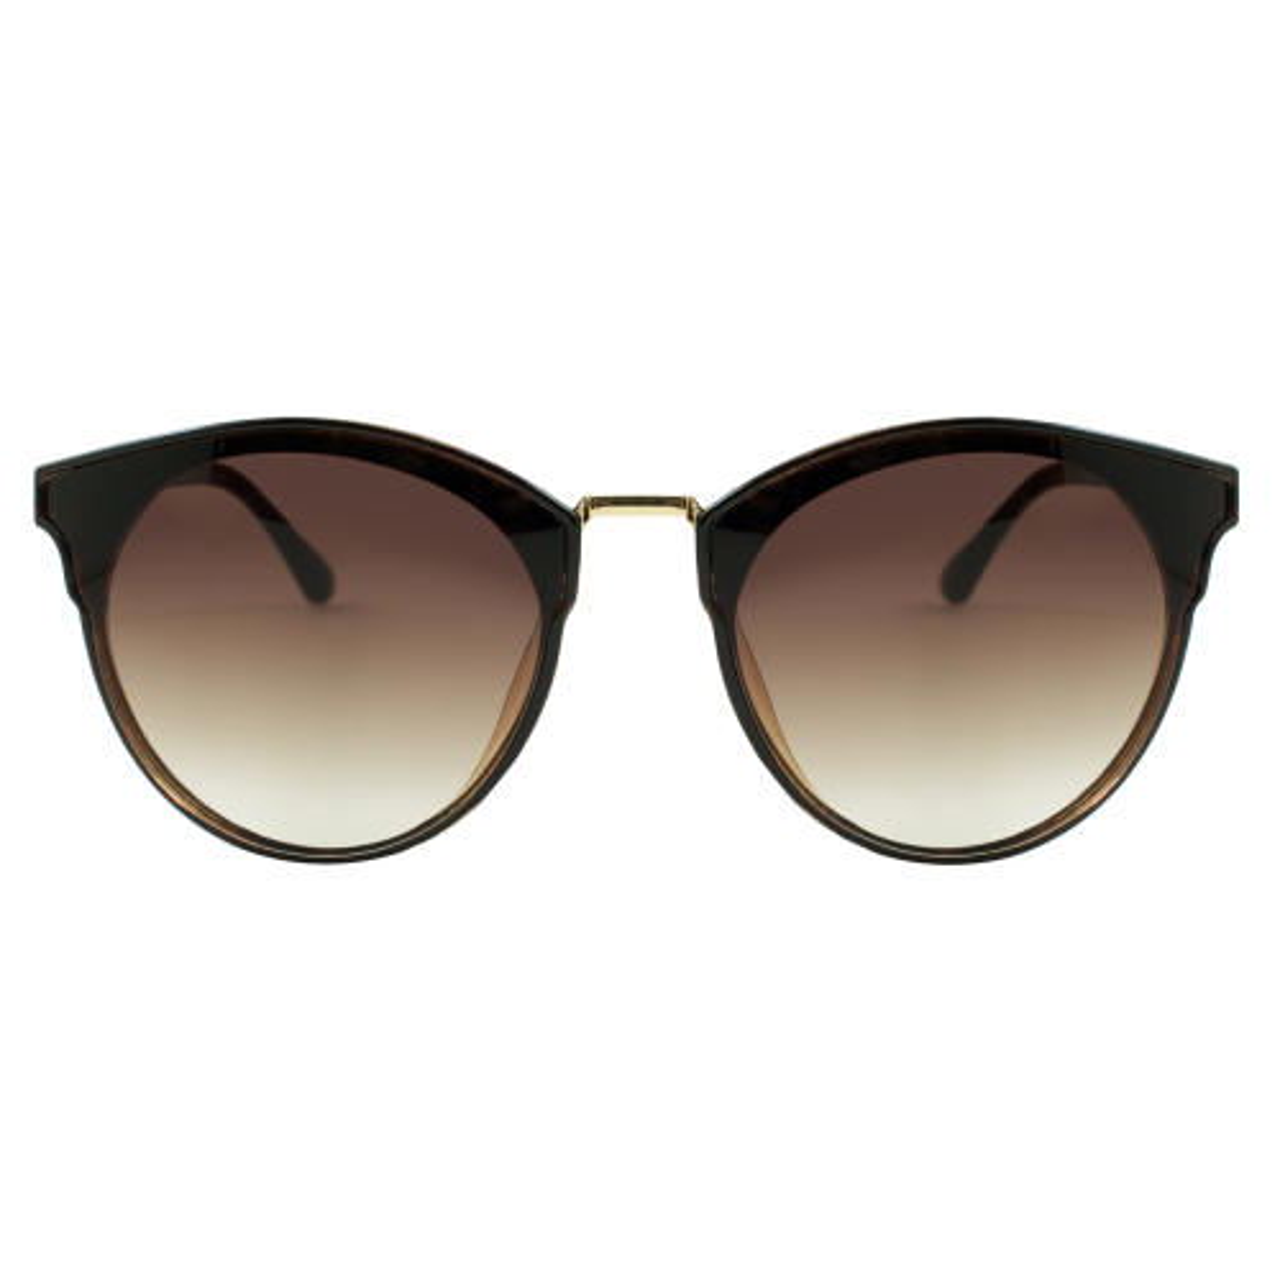 عینک آفتابی زنانه مدل Daily Brown Series